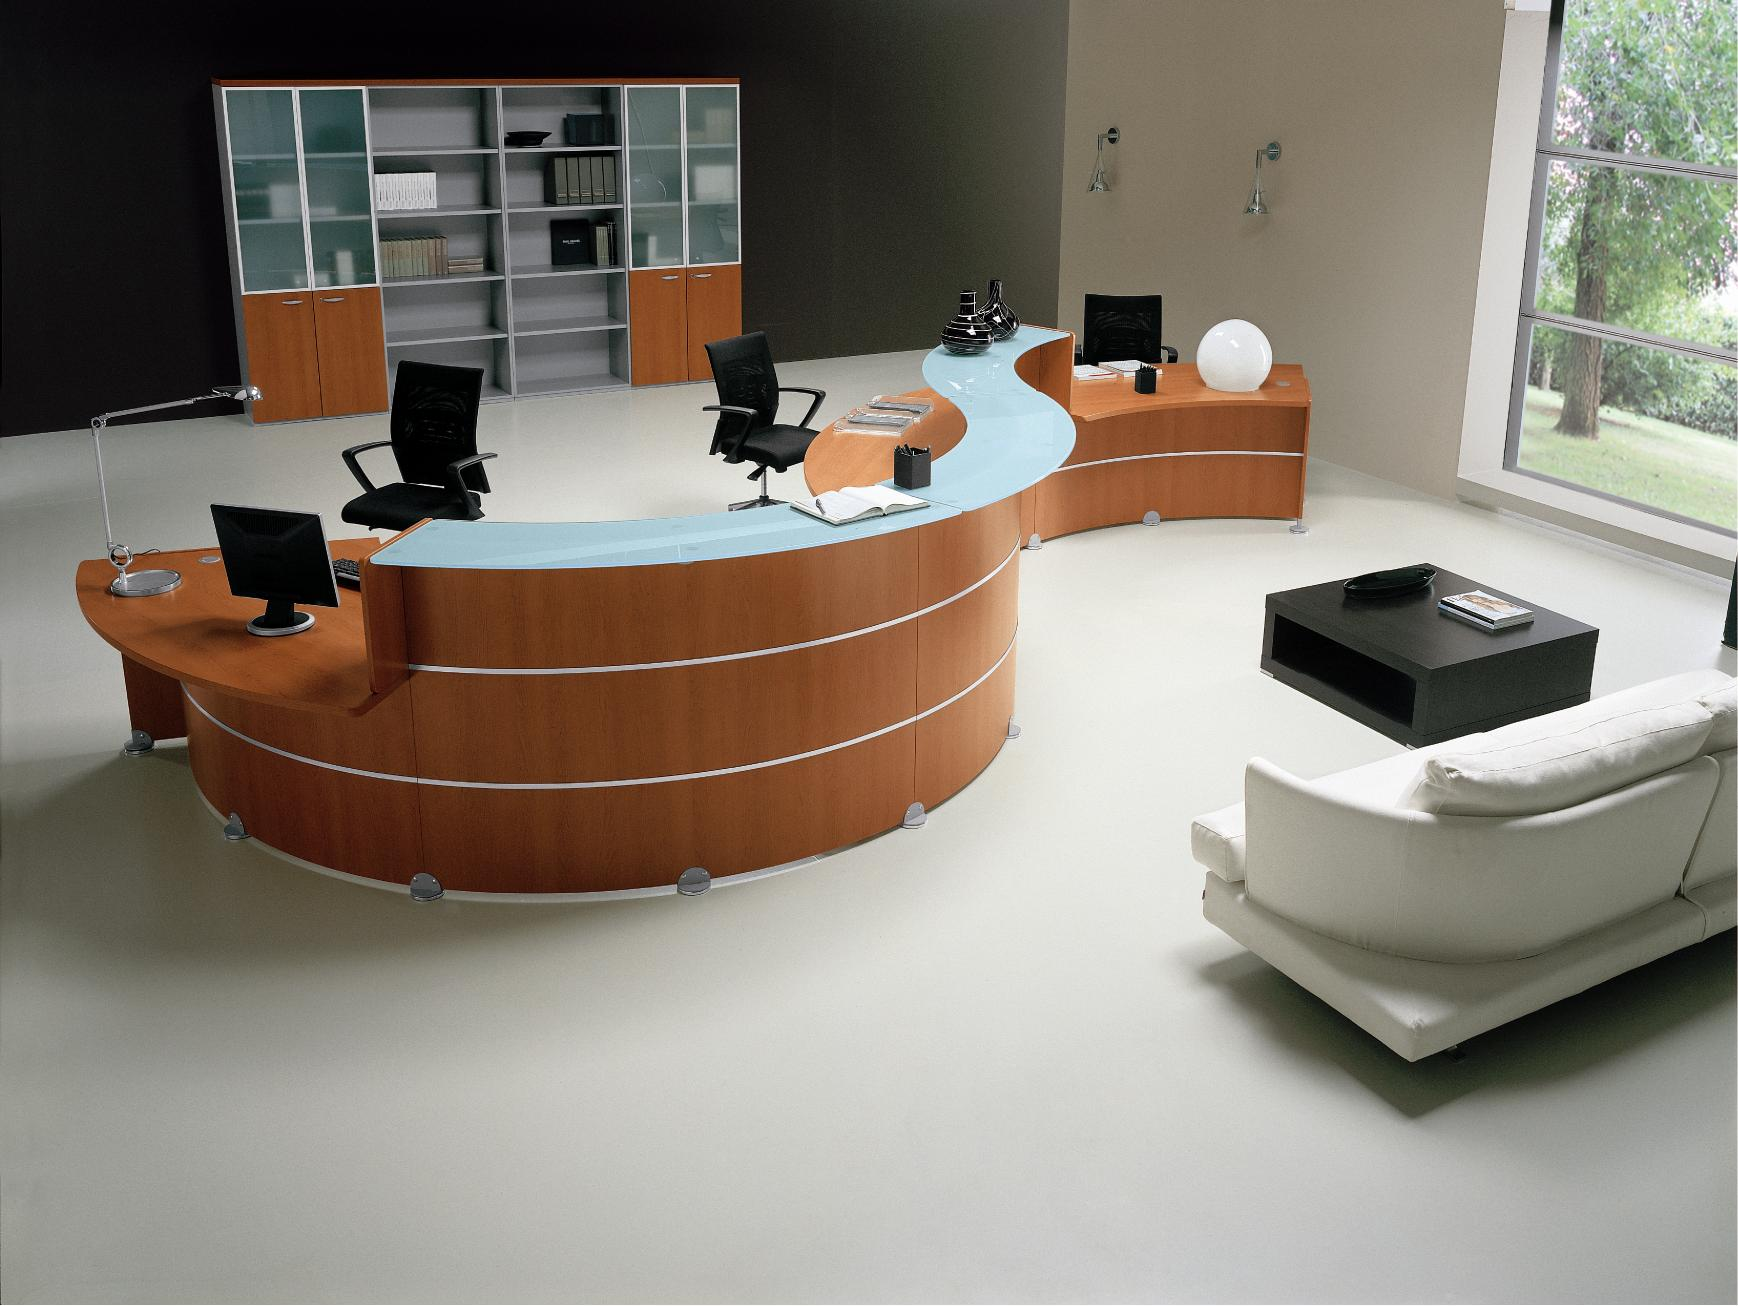 Reception-mid-level-IMAGE 6